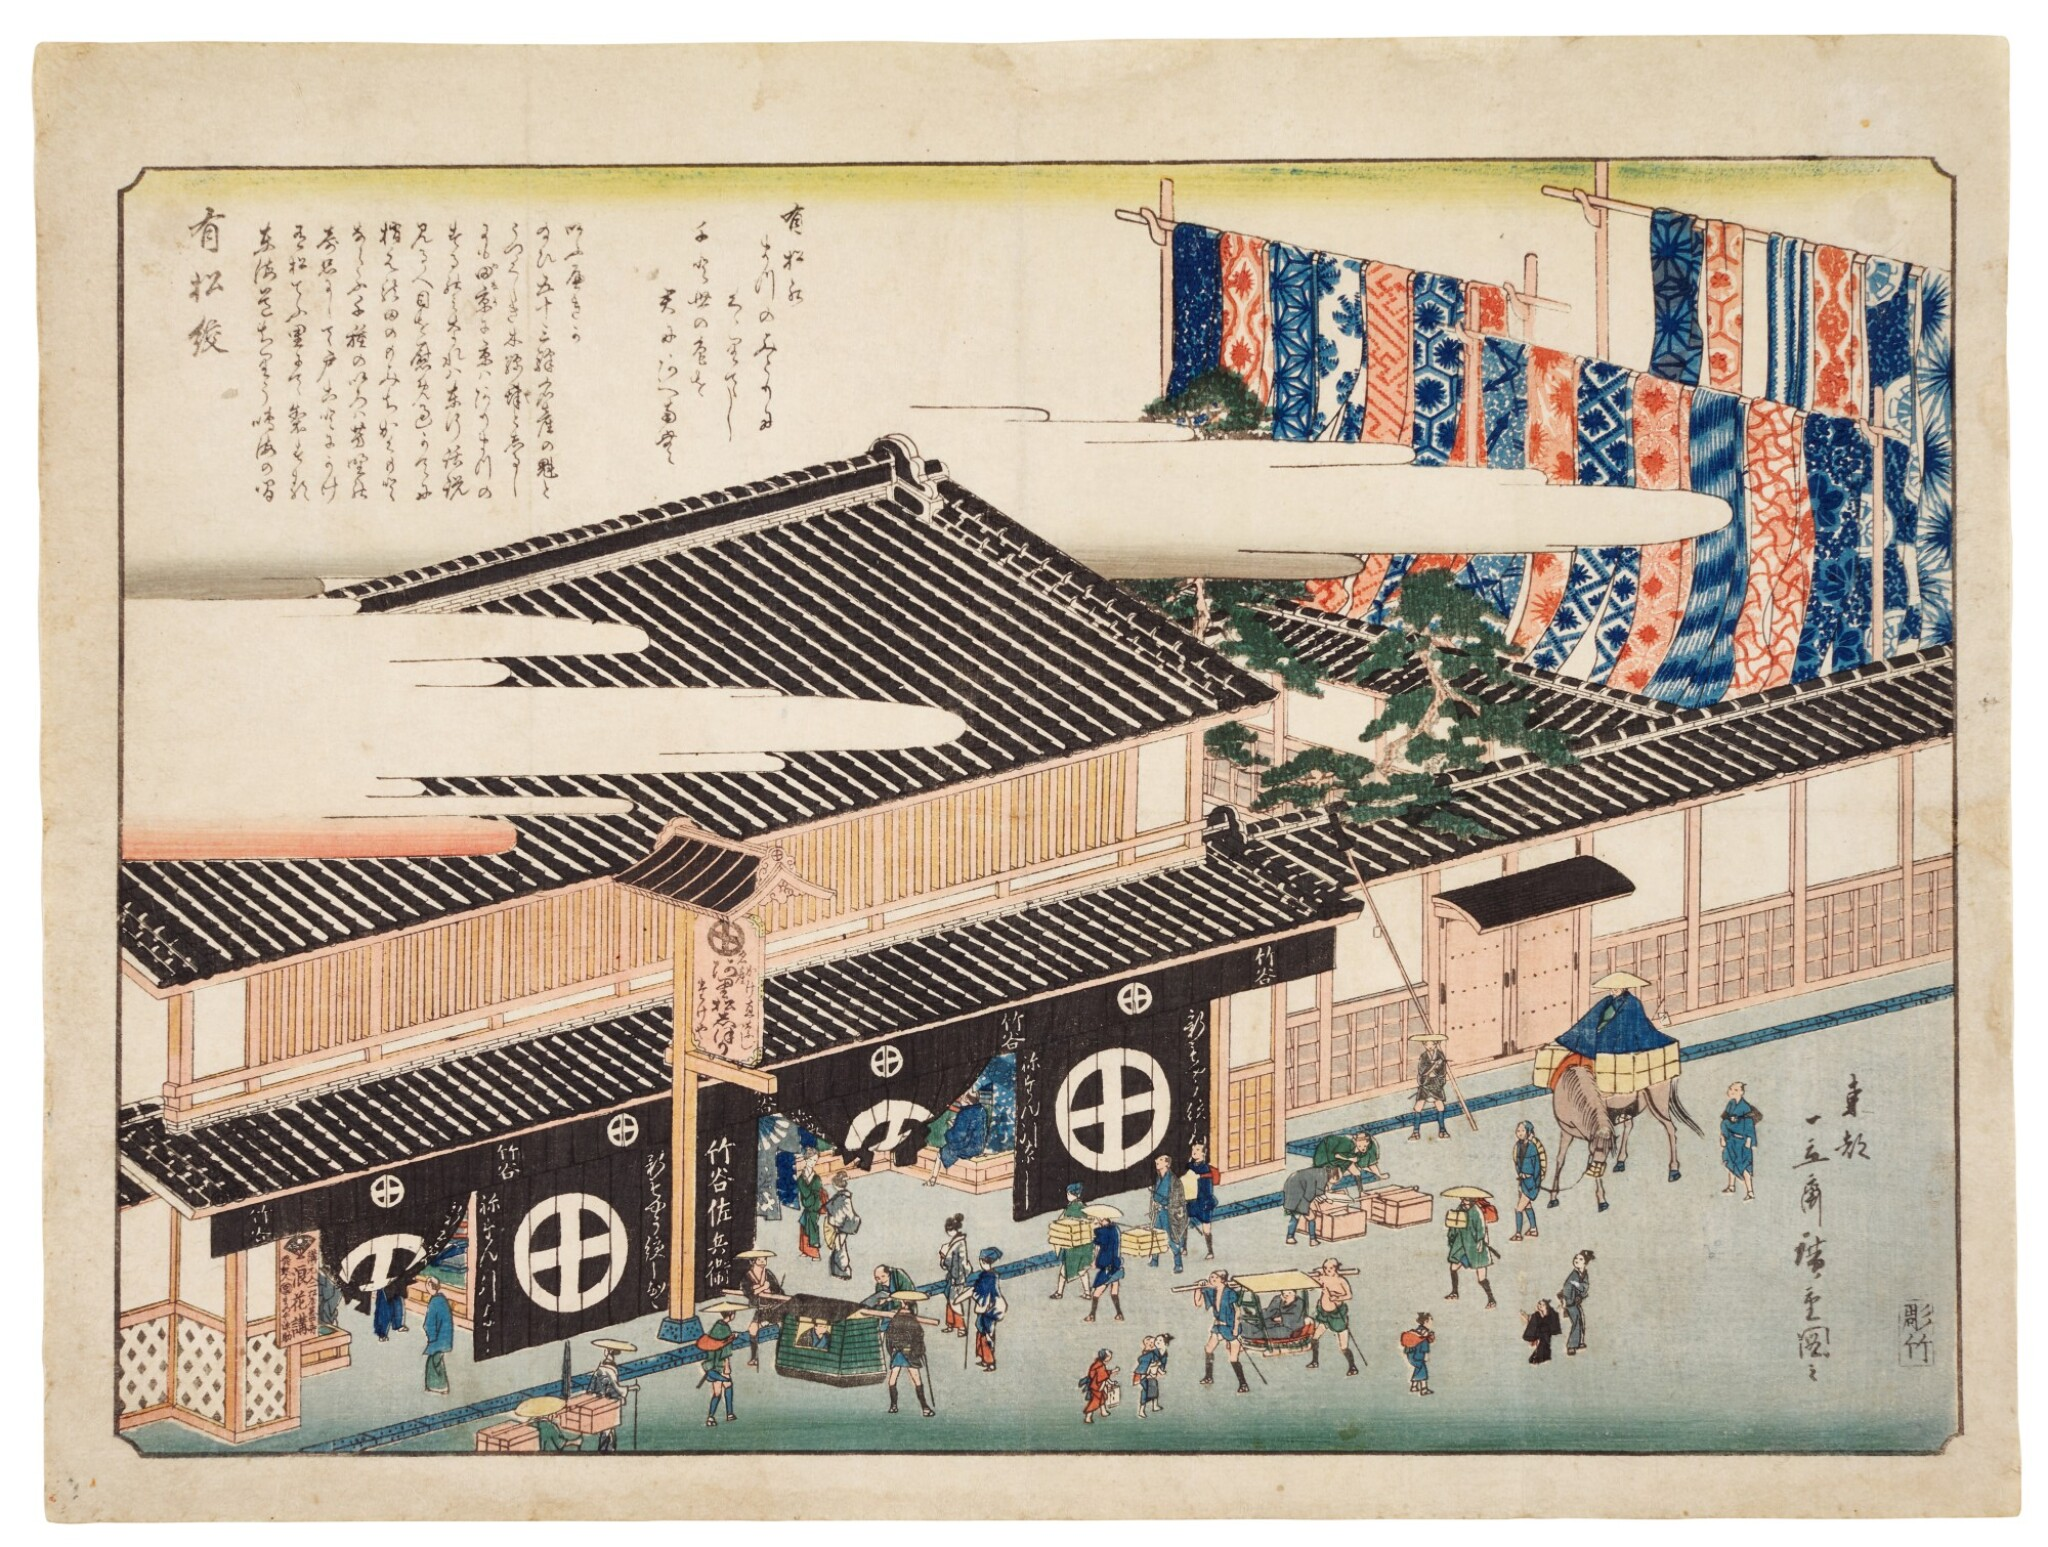 View full screen - View 1 of Lot 12. Utagawa Hiroshige (1797-1858) Arimatsu Tie-dyed Cloth at the Takeya Sahei Storefront (Arimatsu shibori Takeya Sahei misesaki), Edo period, 19th century.